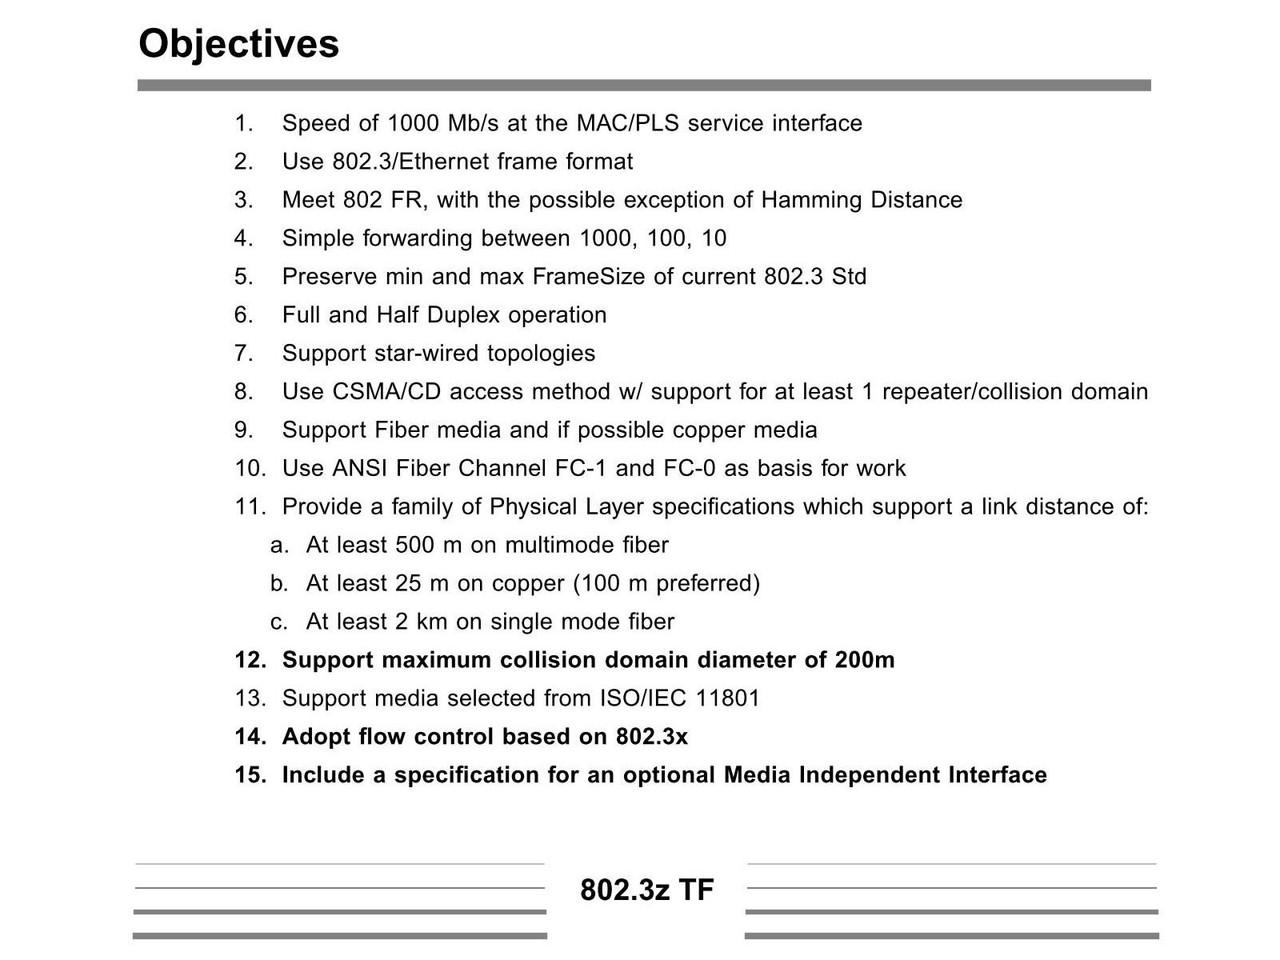 "MIIの話は後ほど。出典はCoeur d'Alene氏の""<a href=""http://grouper.ieee.org/groups/802/3/z/public/presentations/sep1996/HFagenda.pdf"" class=""strong bn"" target=""_blank"">IEEE 802.3z Gigabit Task Force</a>"""